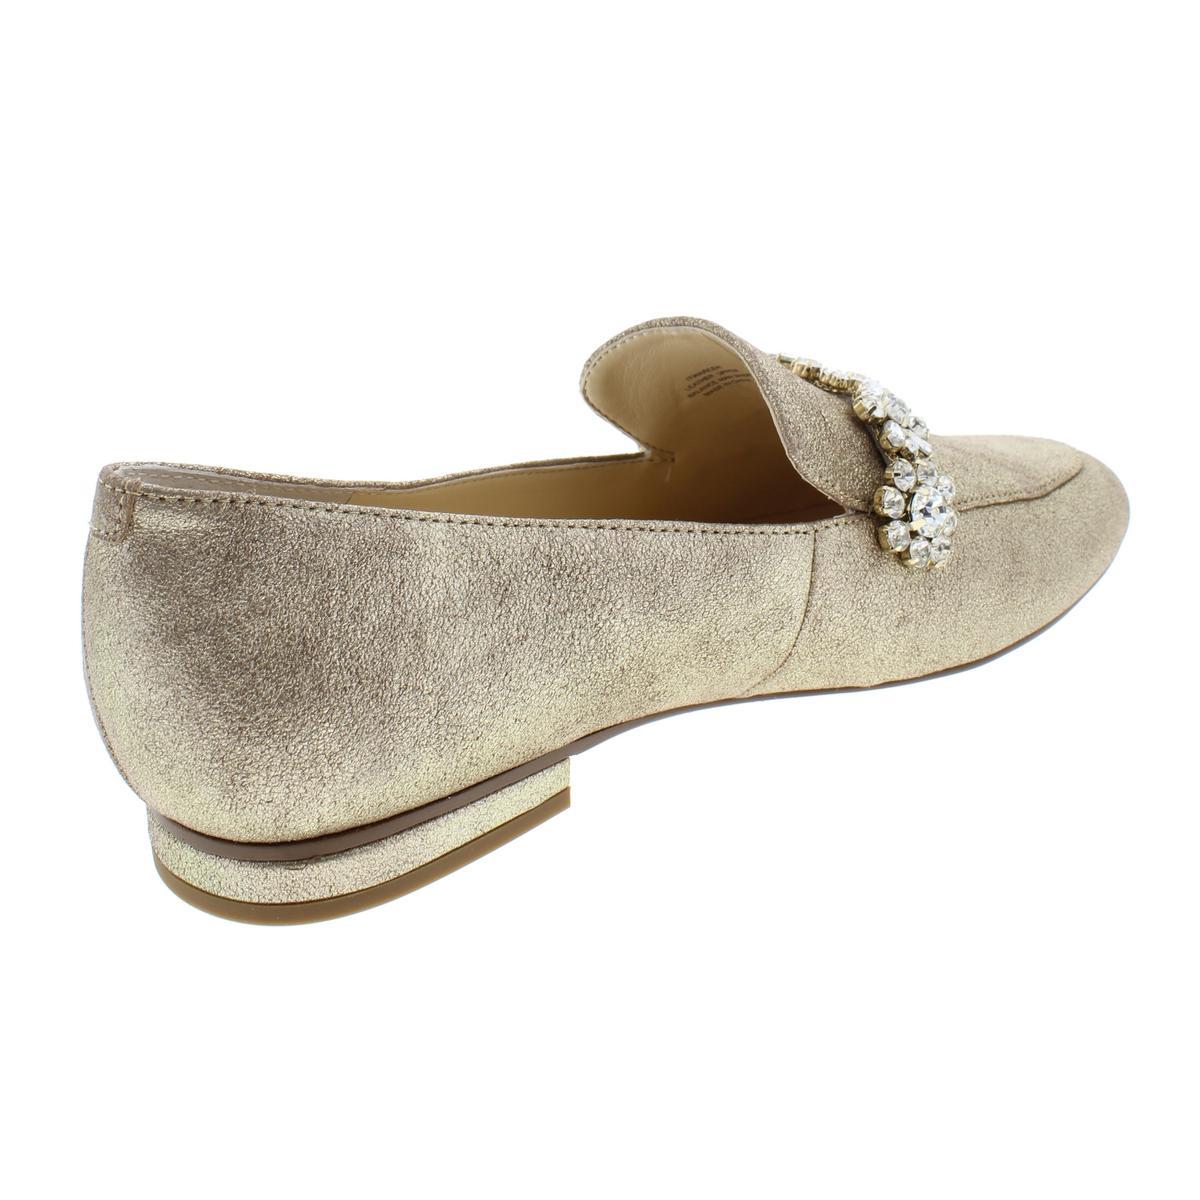 Ivanka Trump Womens Wareen Leather Rhinestones Fashion Loafers Shoes BHFO 9685